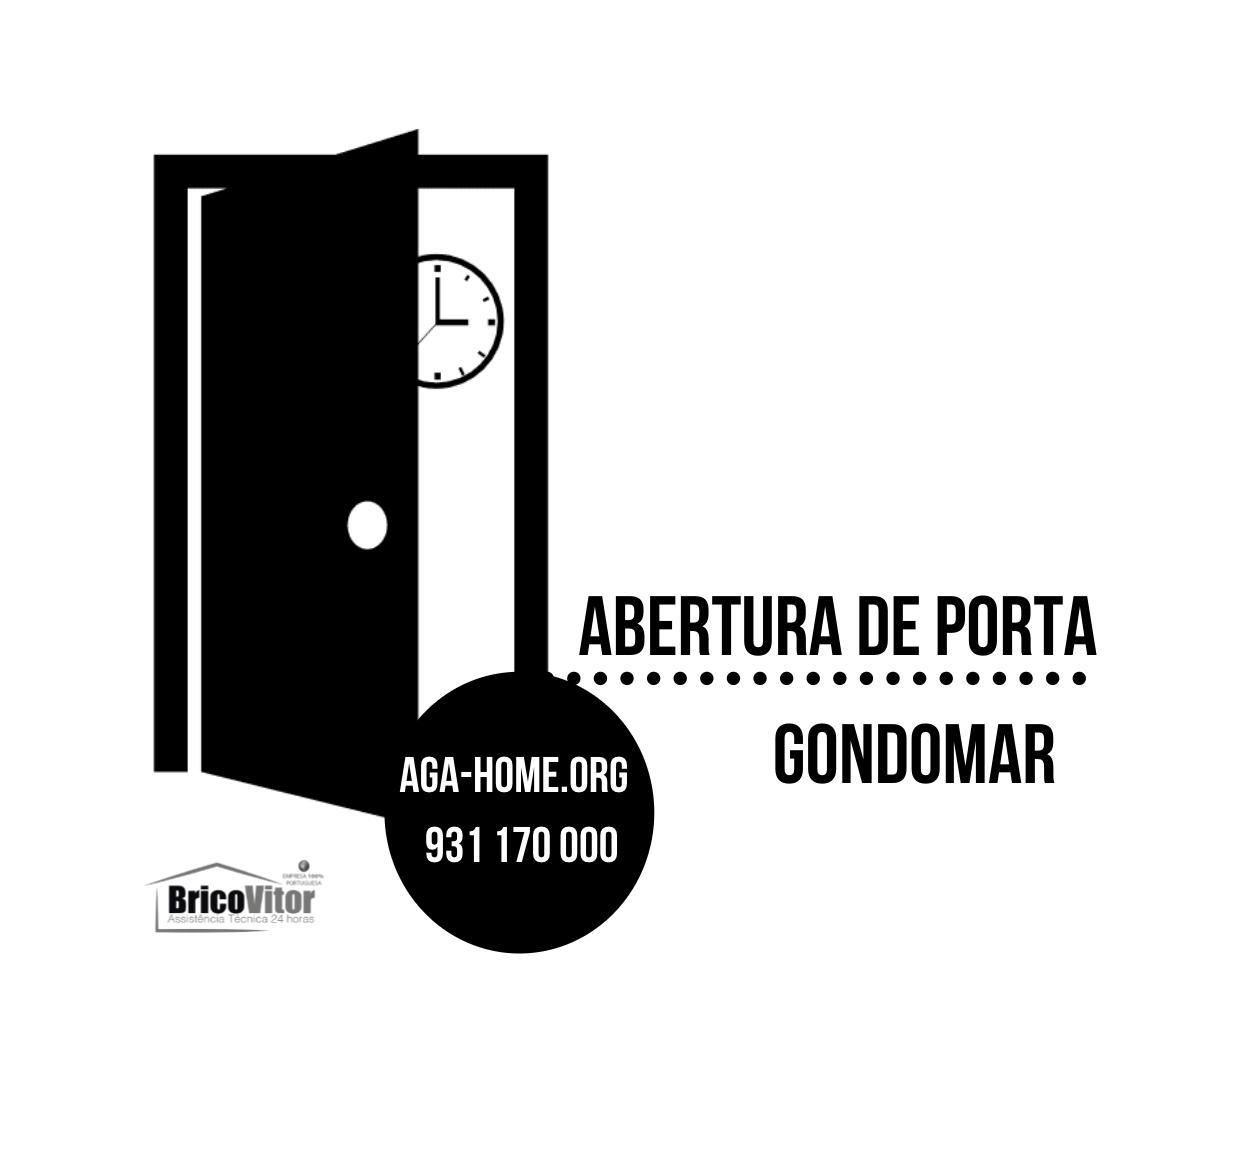 Abertura de Portas Gondomar